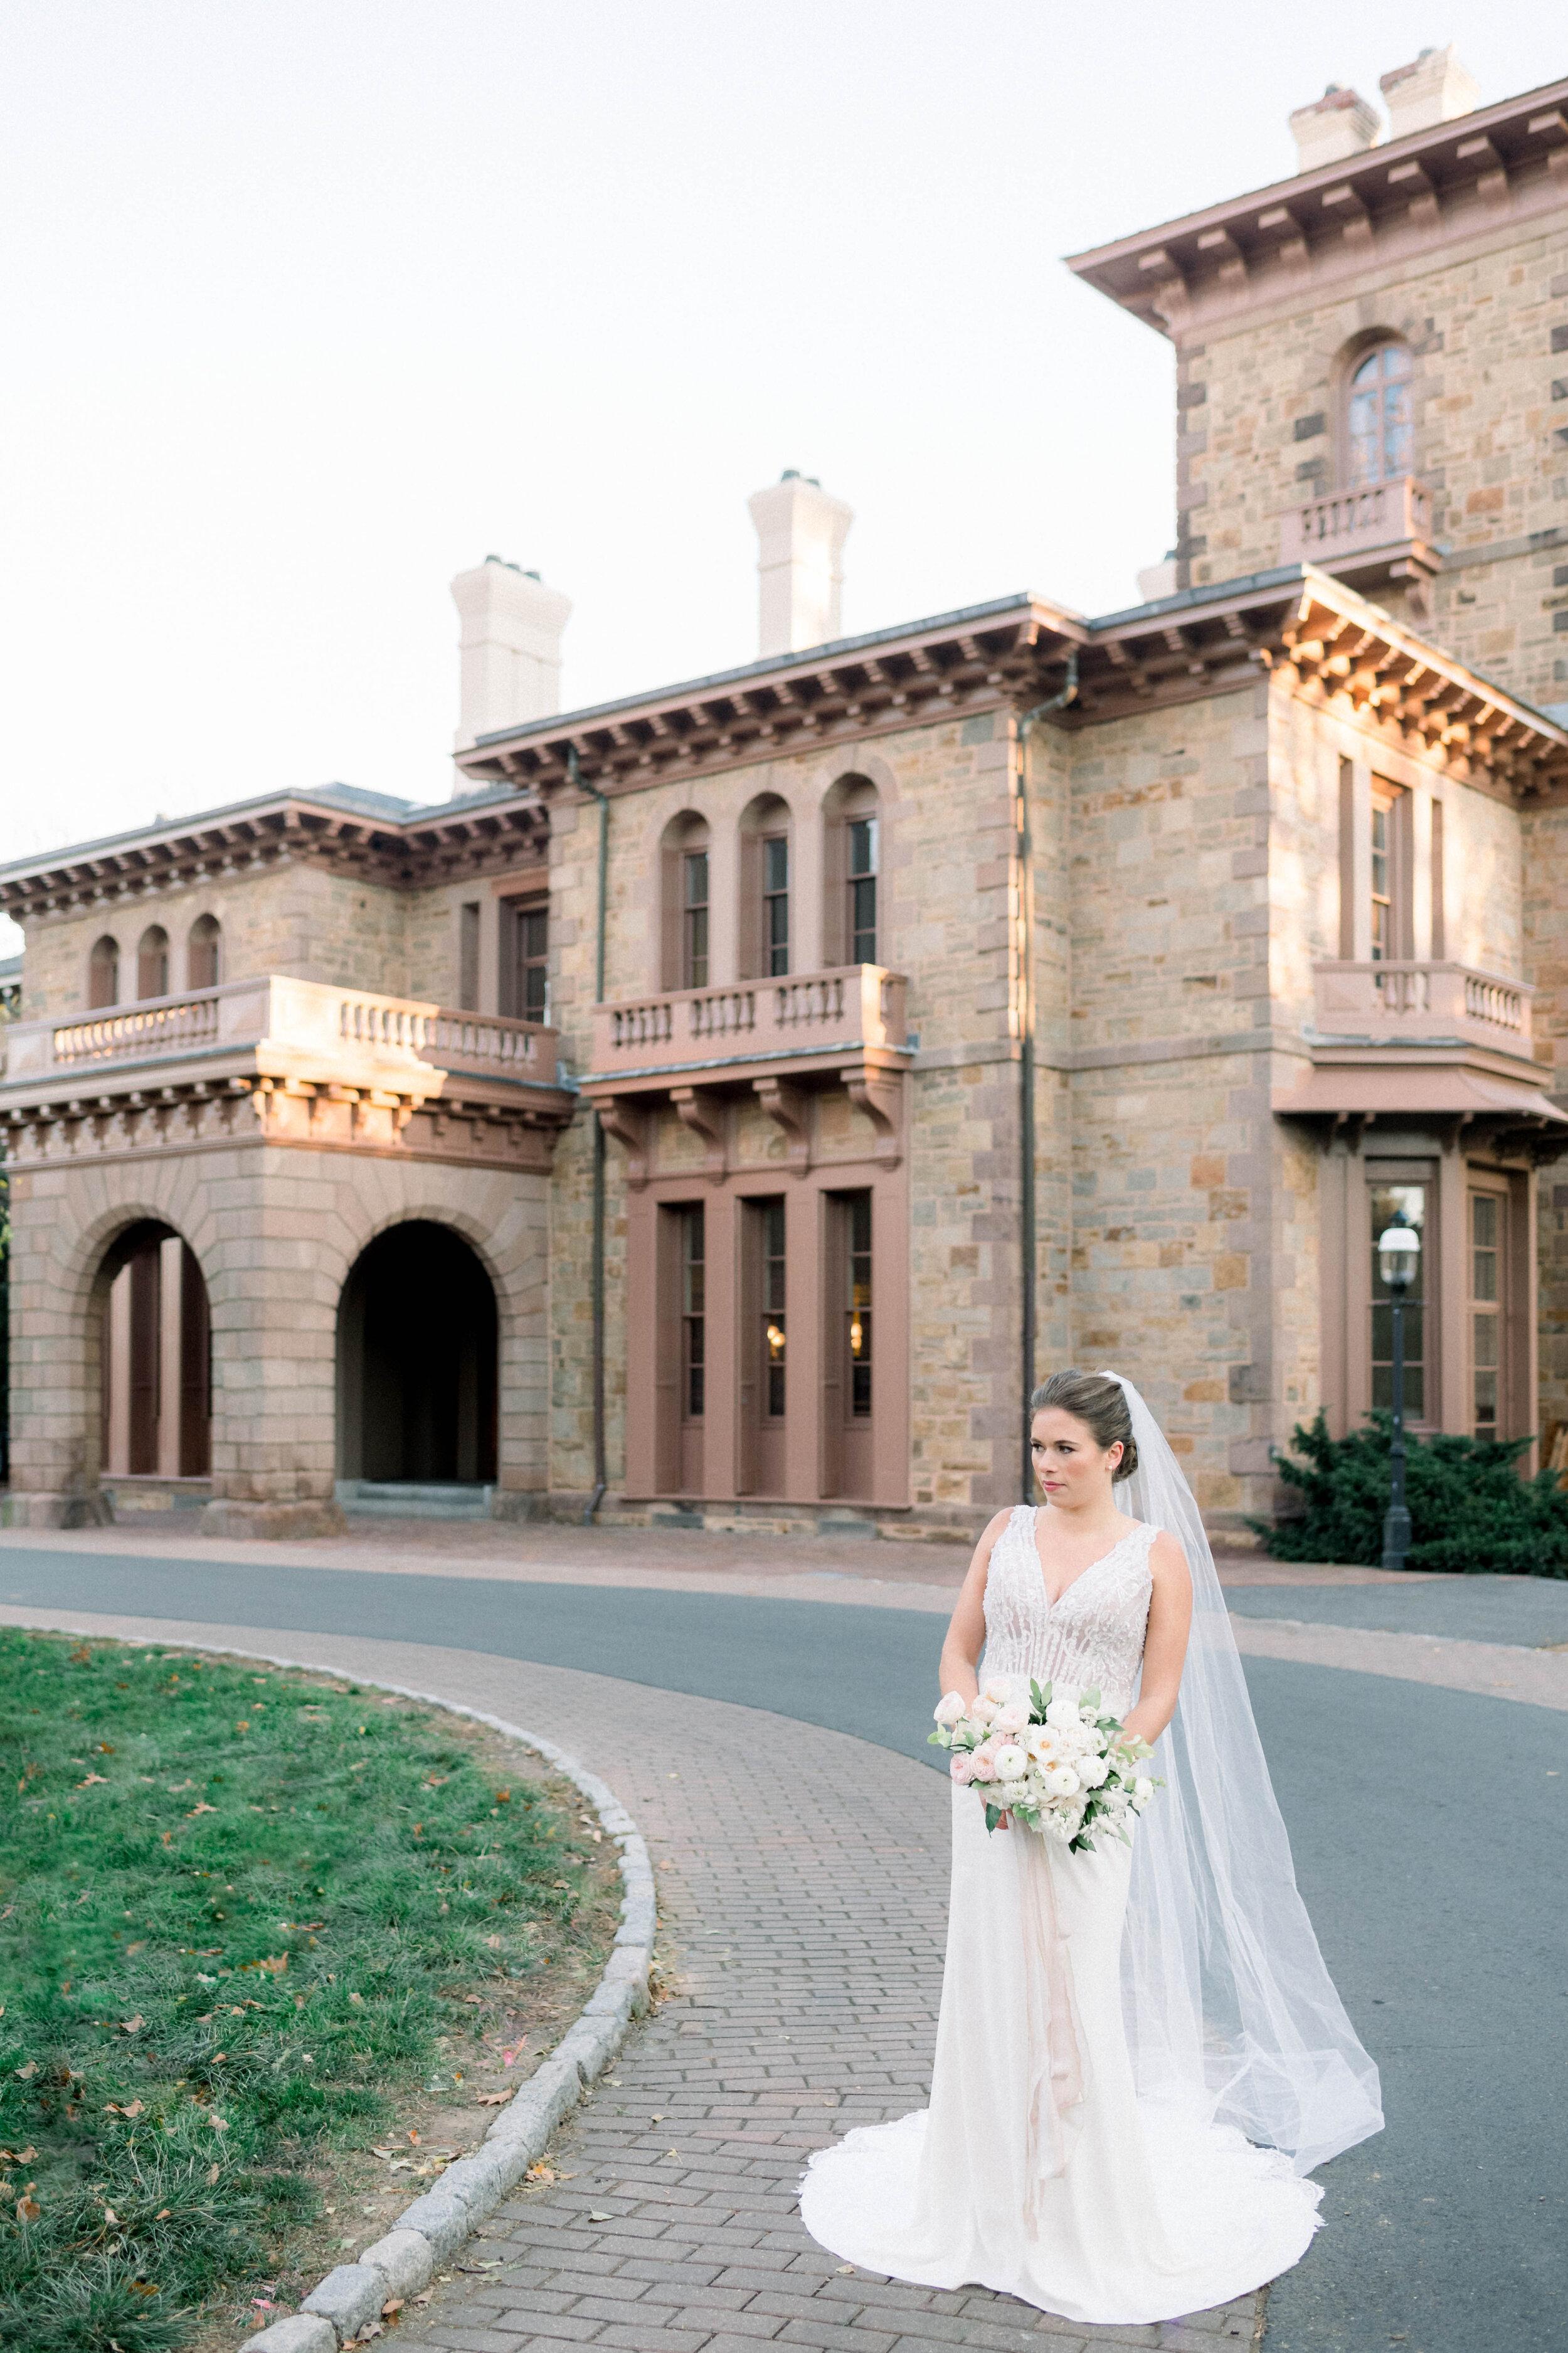 Fine Art Bride Editorial at Princeton University featured on Glittery Bride